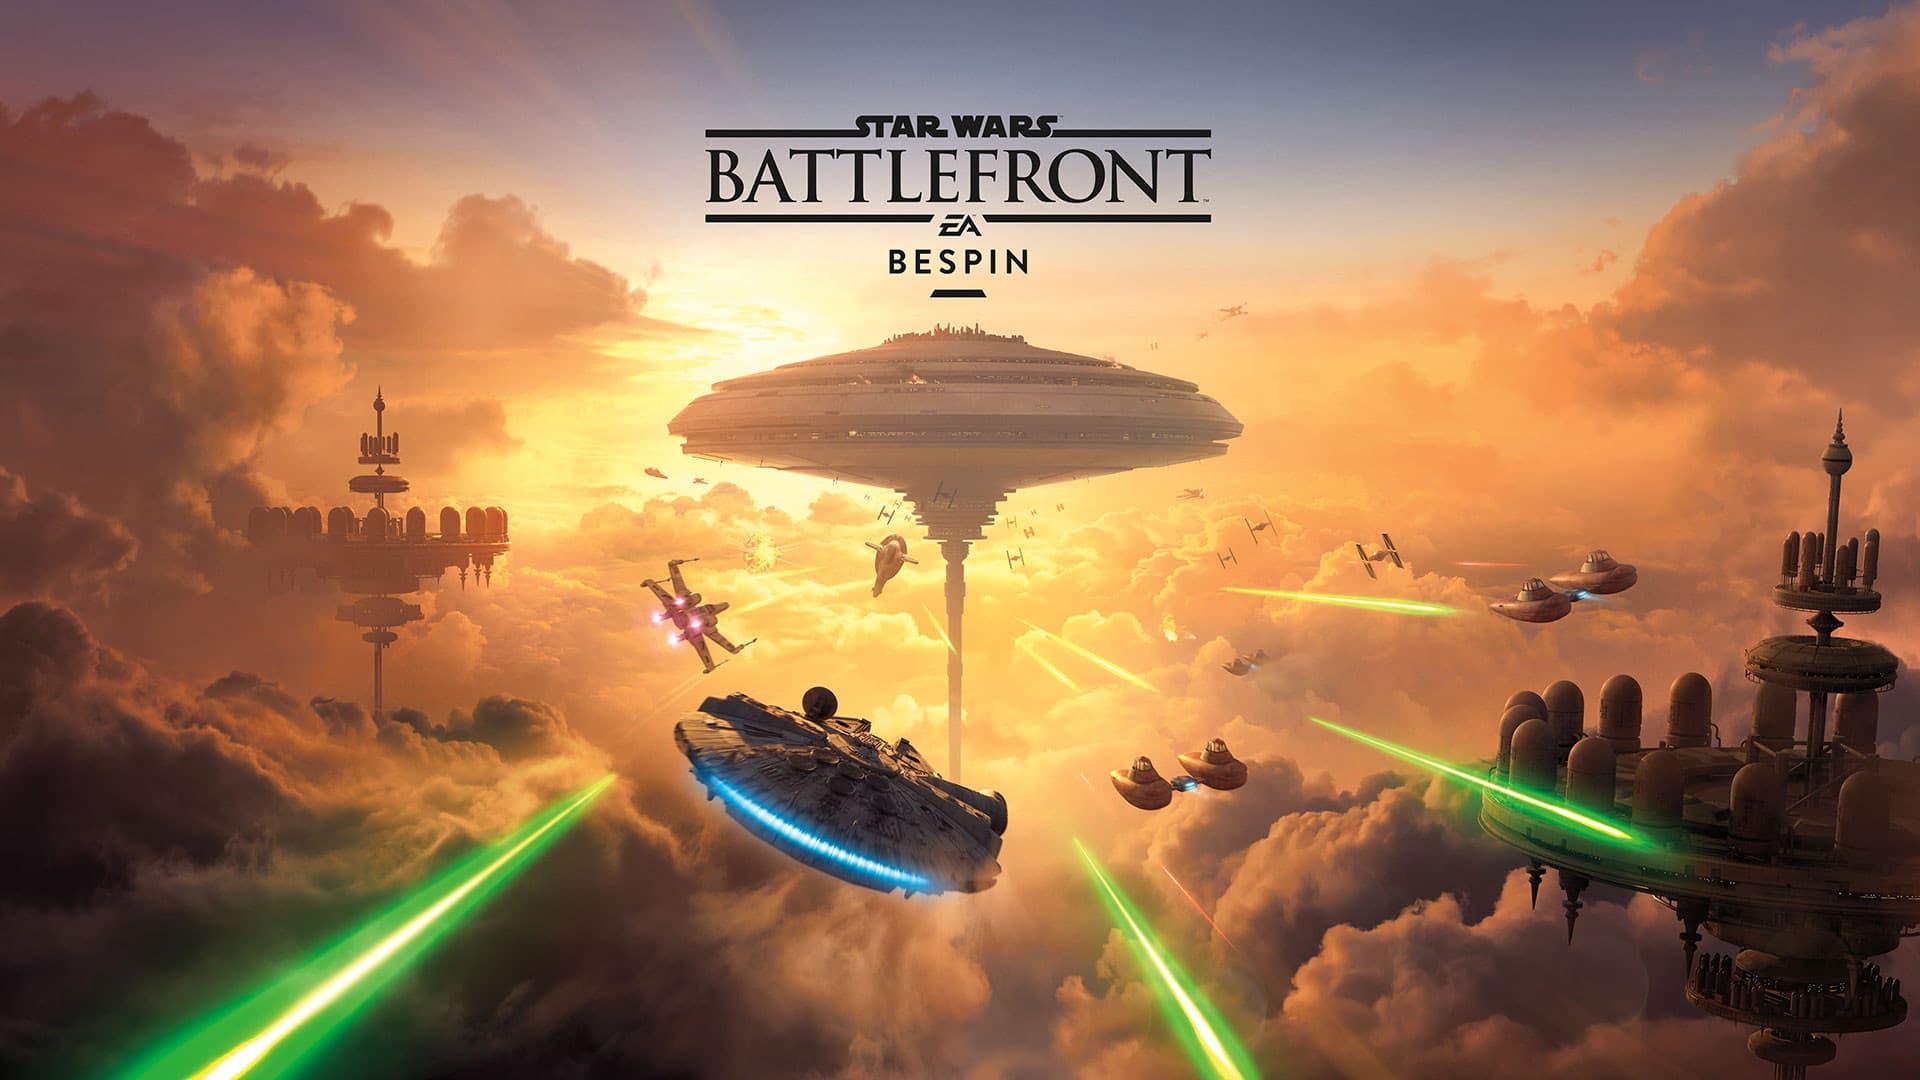 Jaquette Star Wars : Battlefront - Bespin